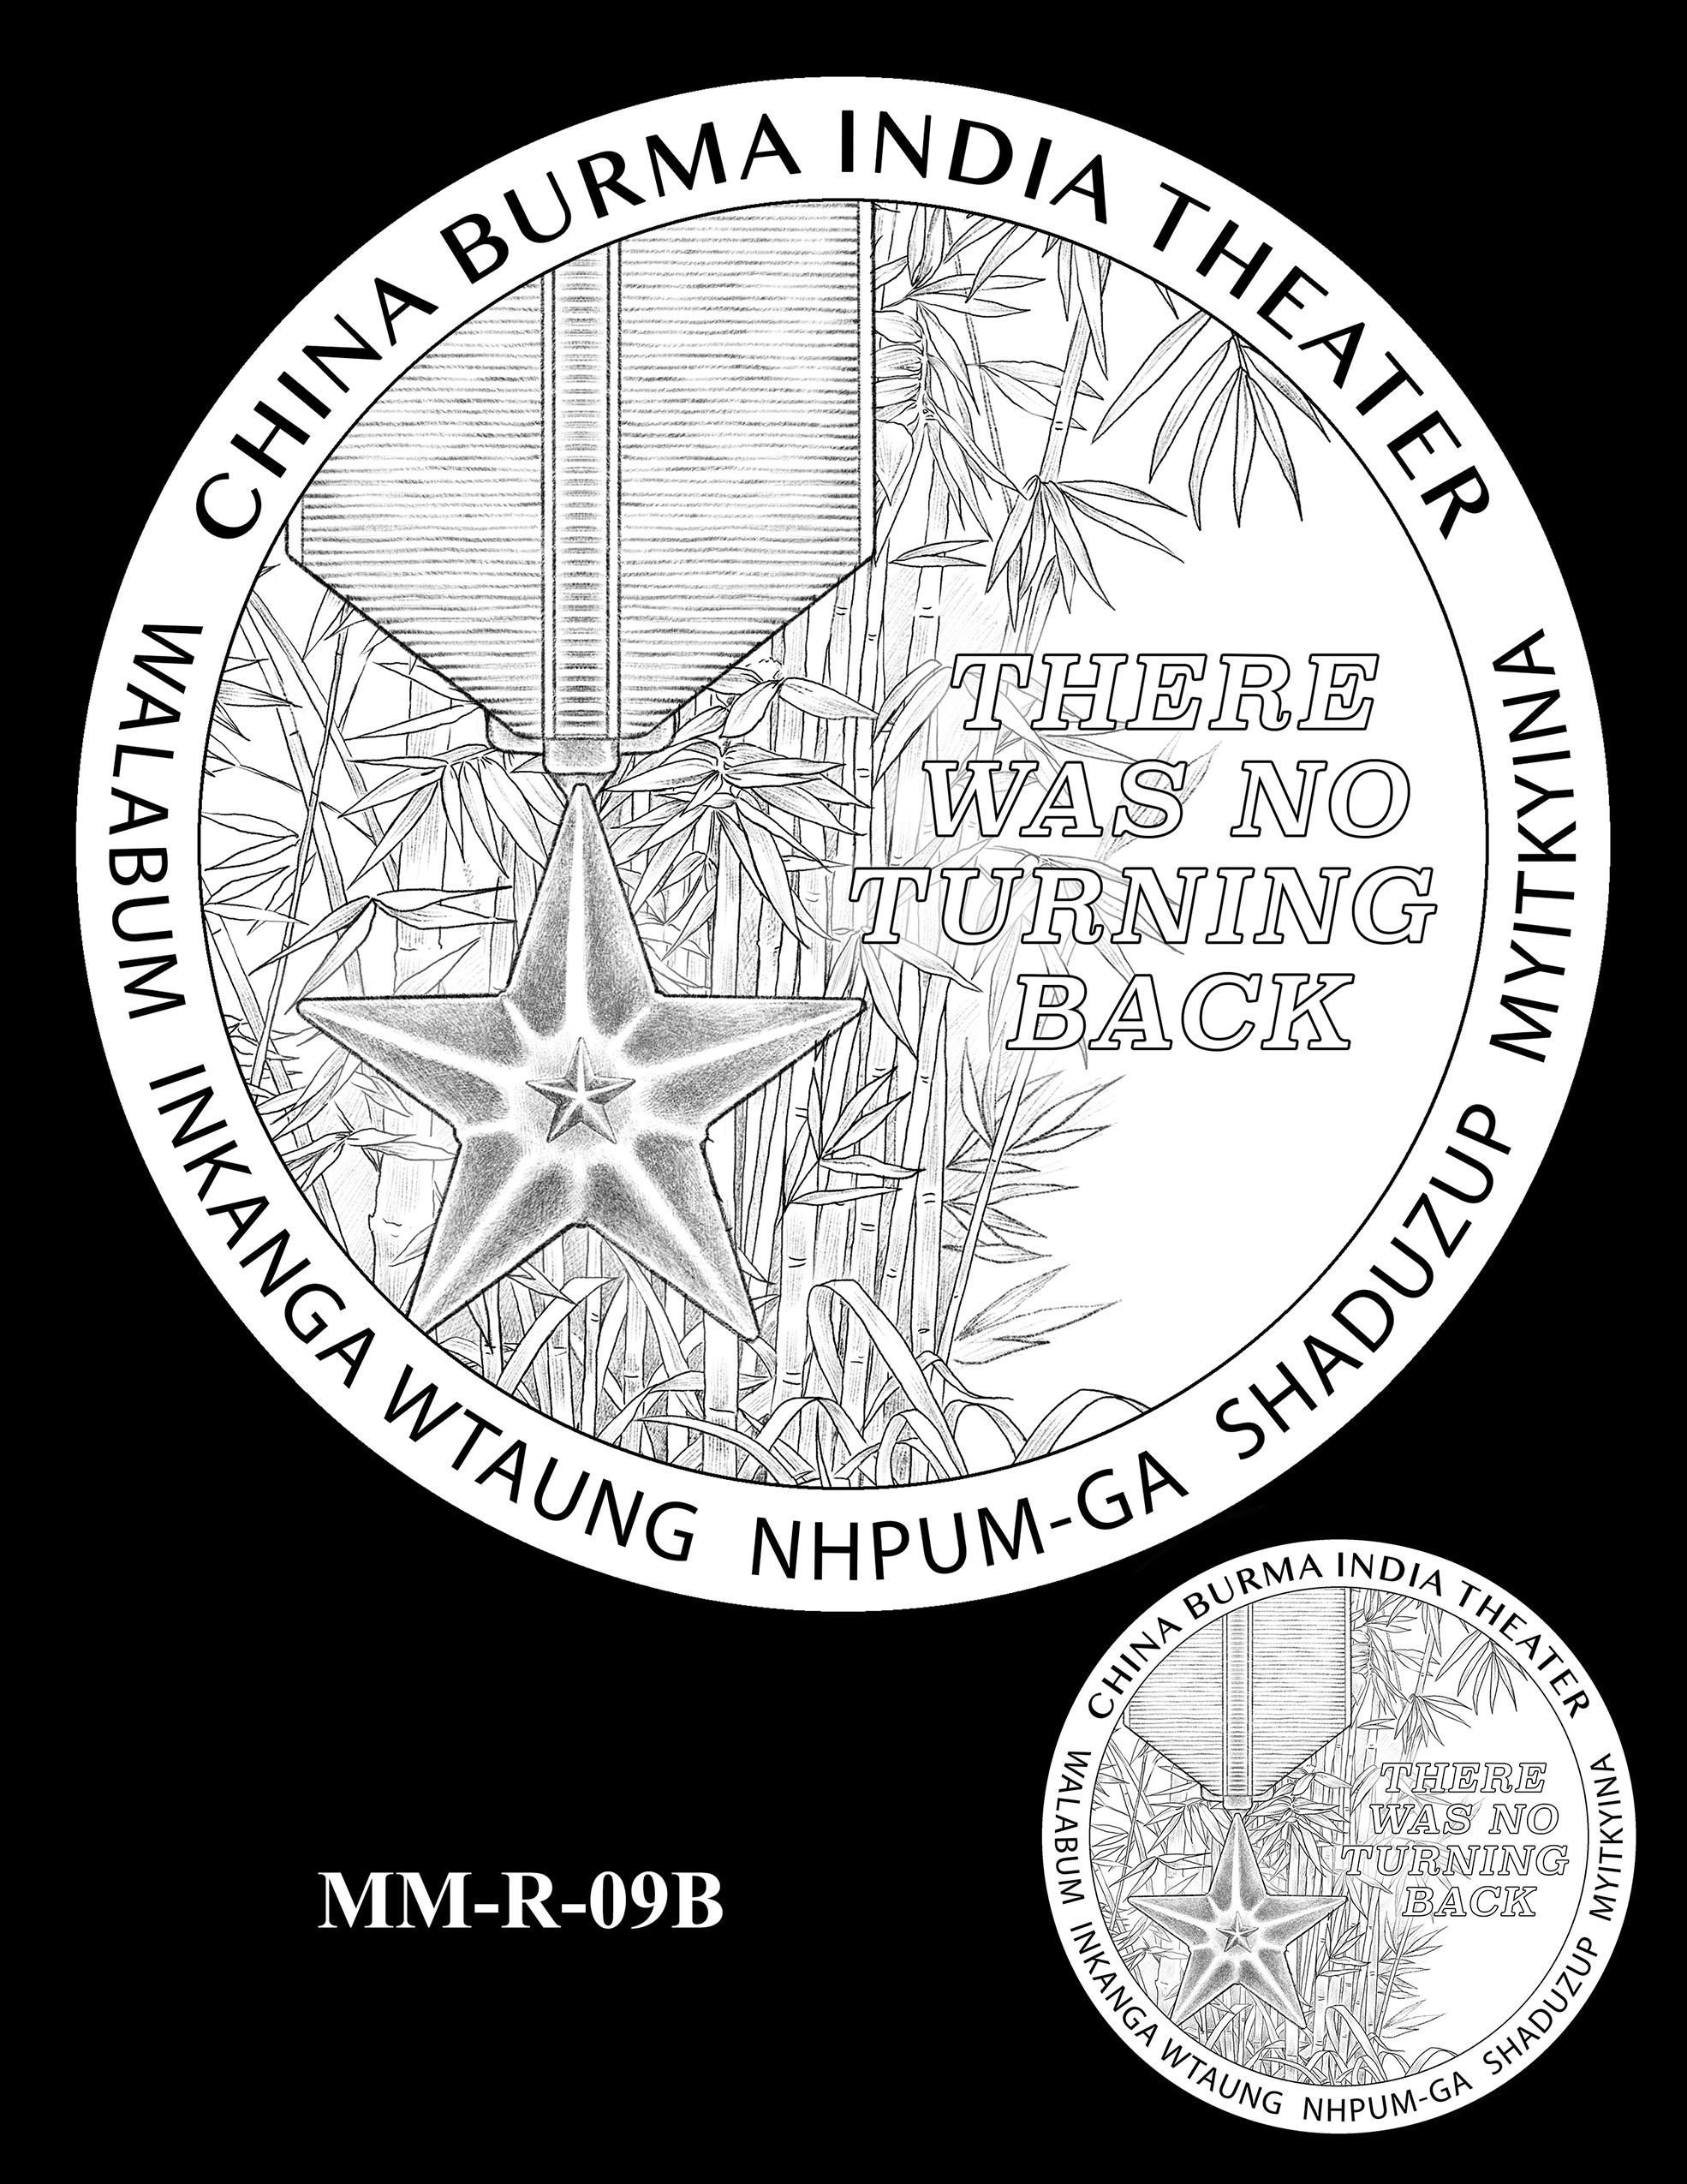 MM-R-09B -- Merrill's Marauders Congressional Gold Medal